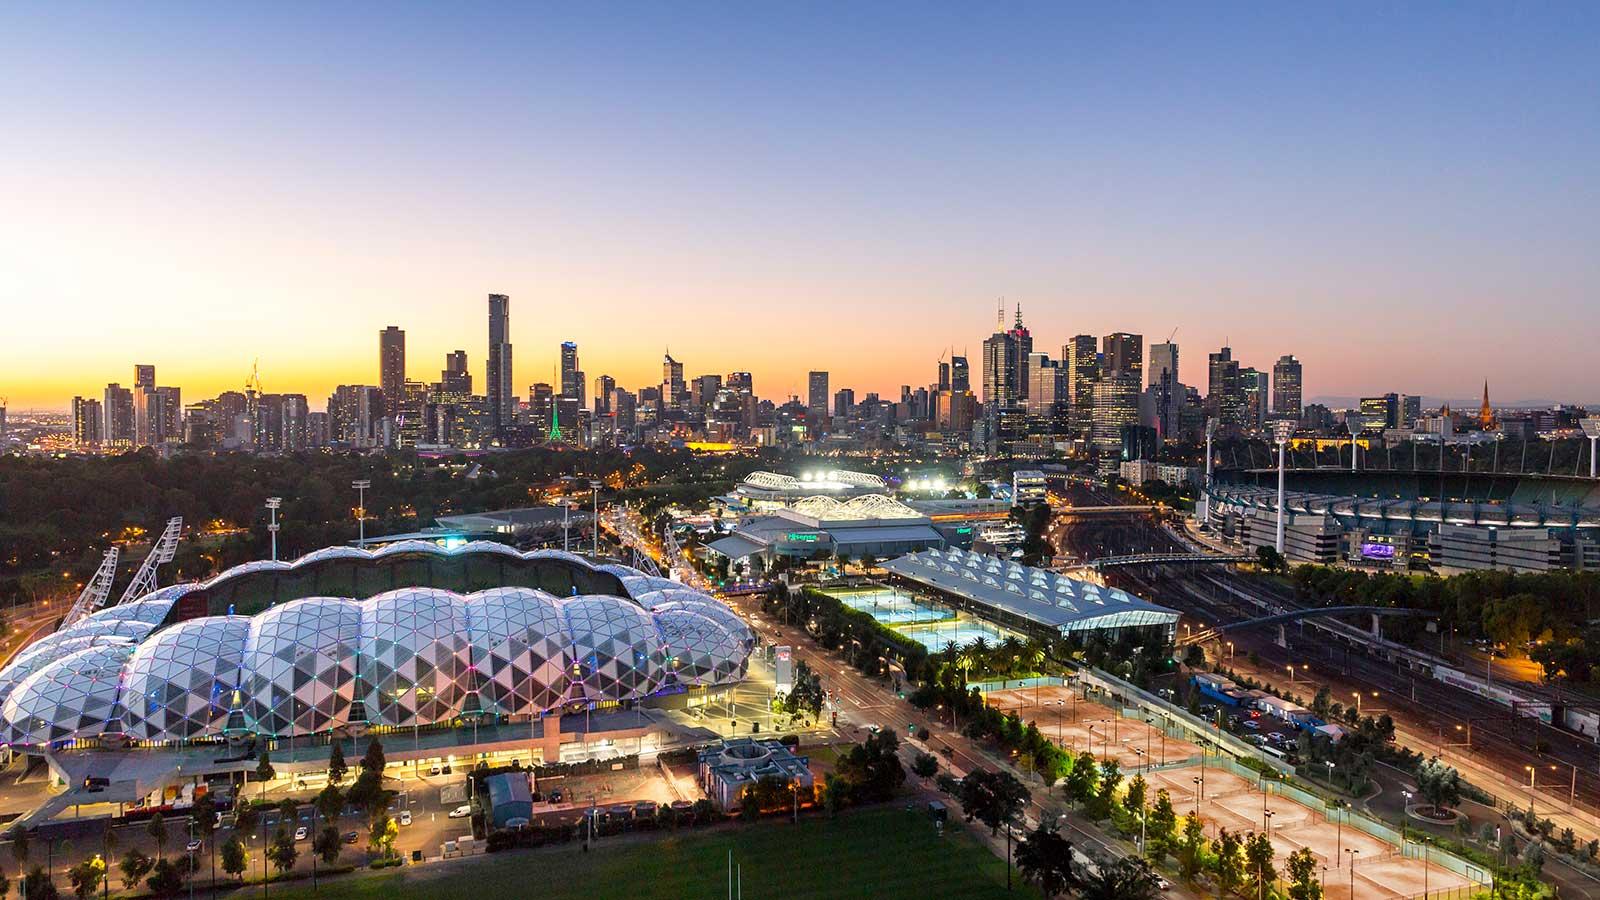 Melbourne Park, Melbourne, Victoria, Australia